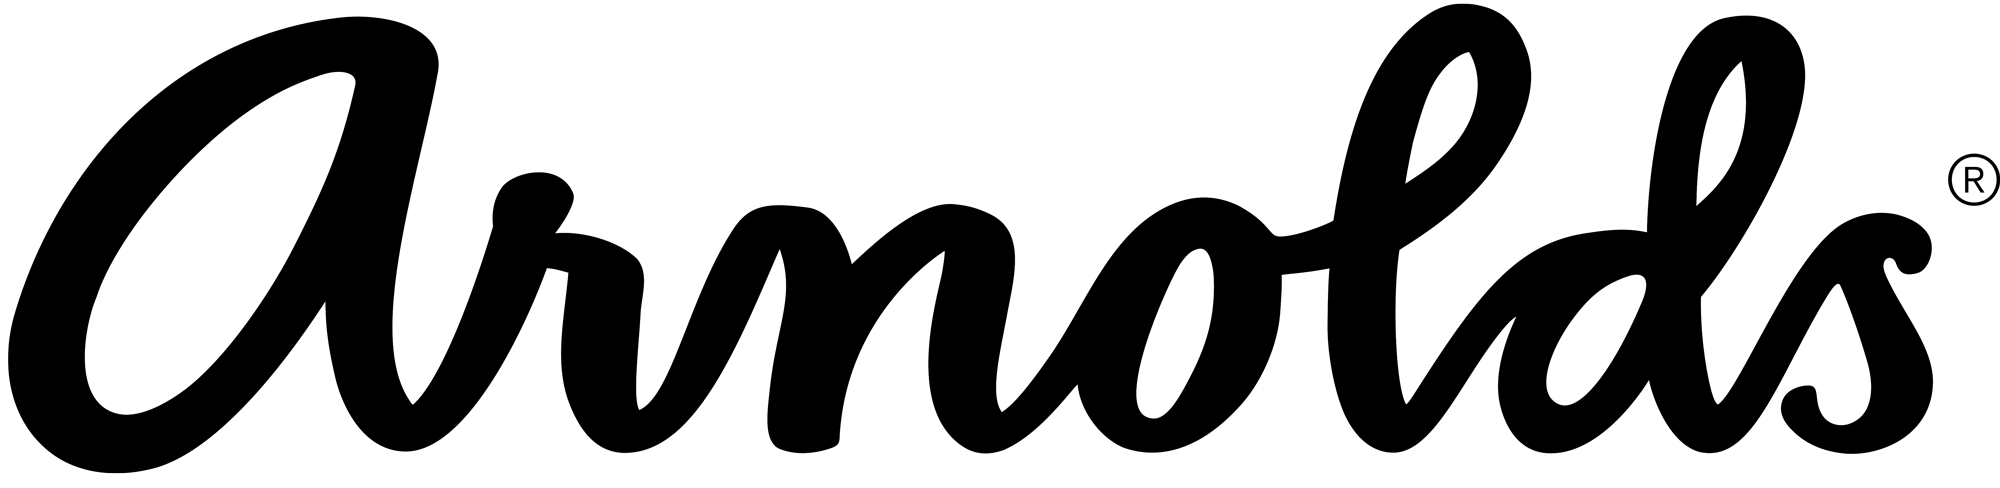 Arnolds_logo